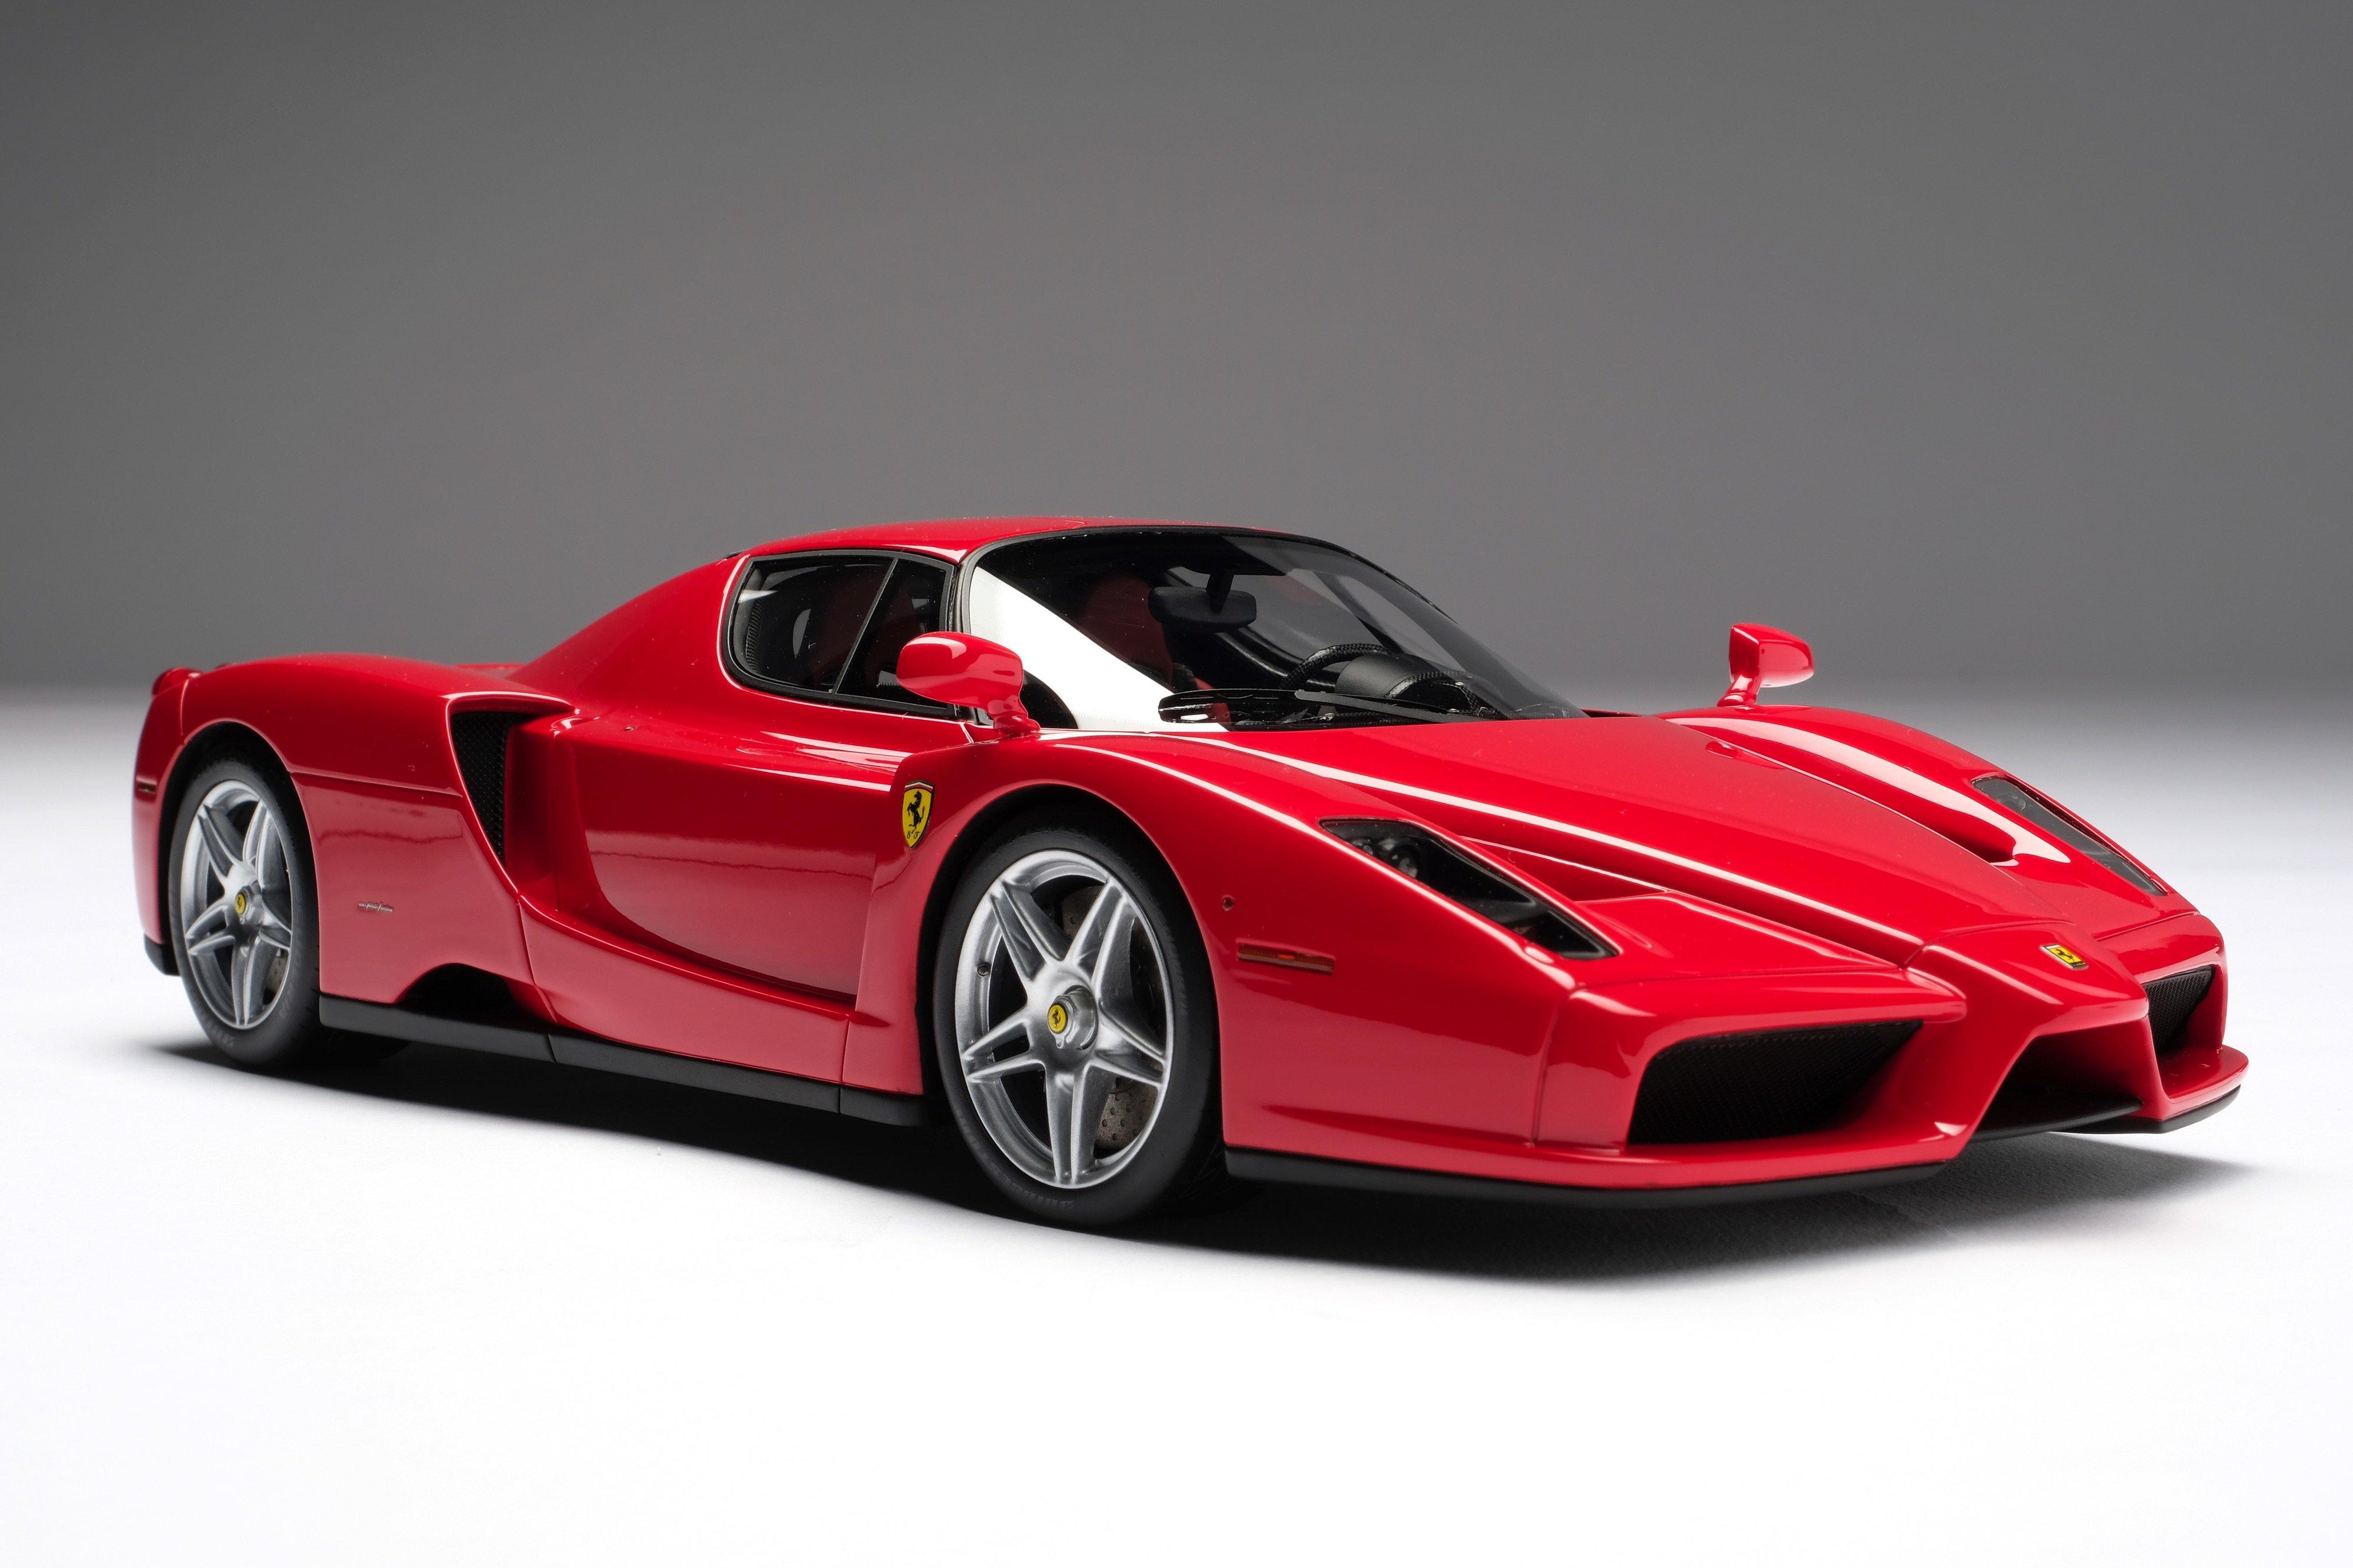 Amalgam Ferrari Enzo Rot 2002 1 18 Hansecars Modellautos Hansecars Exklusive Sammlermodelle